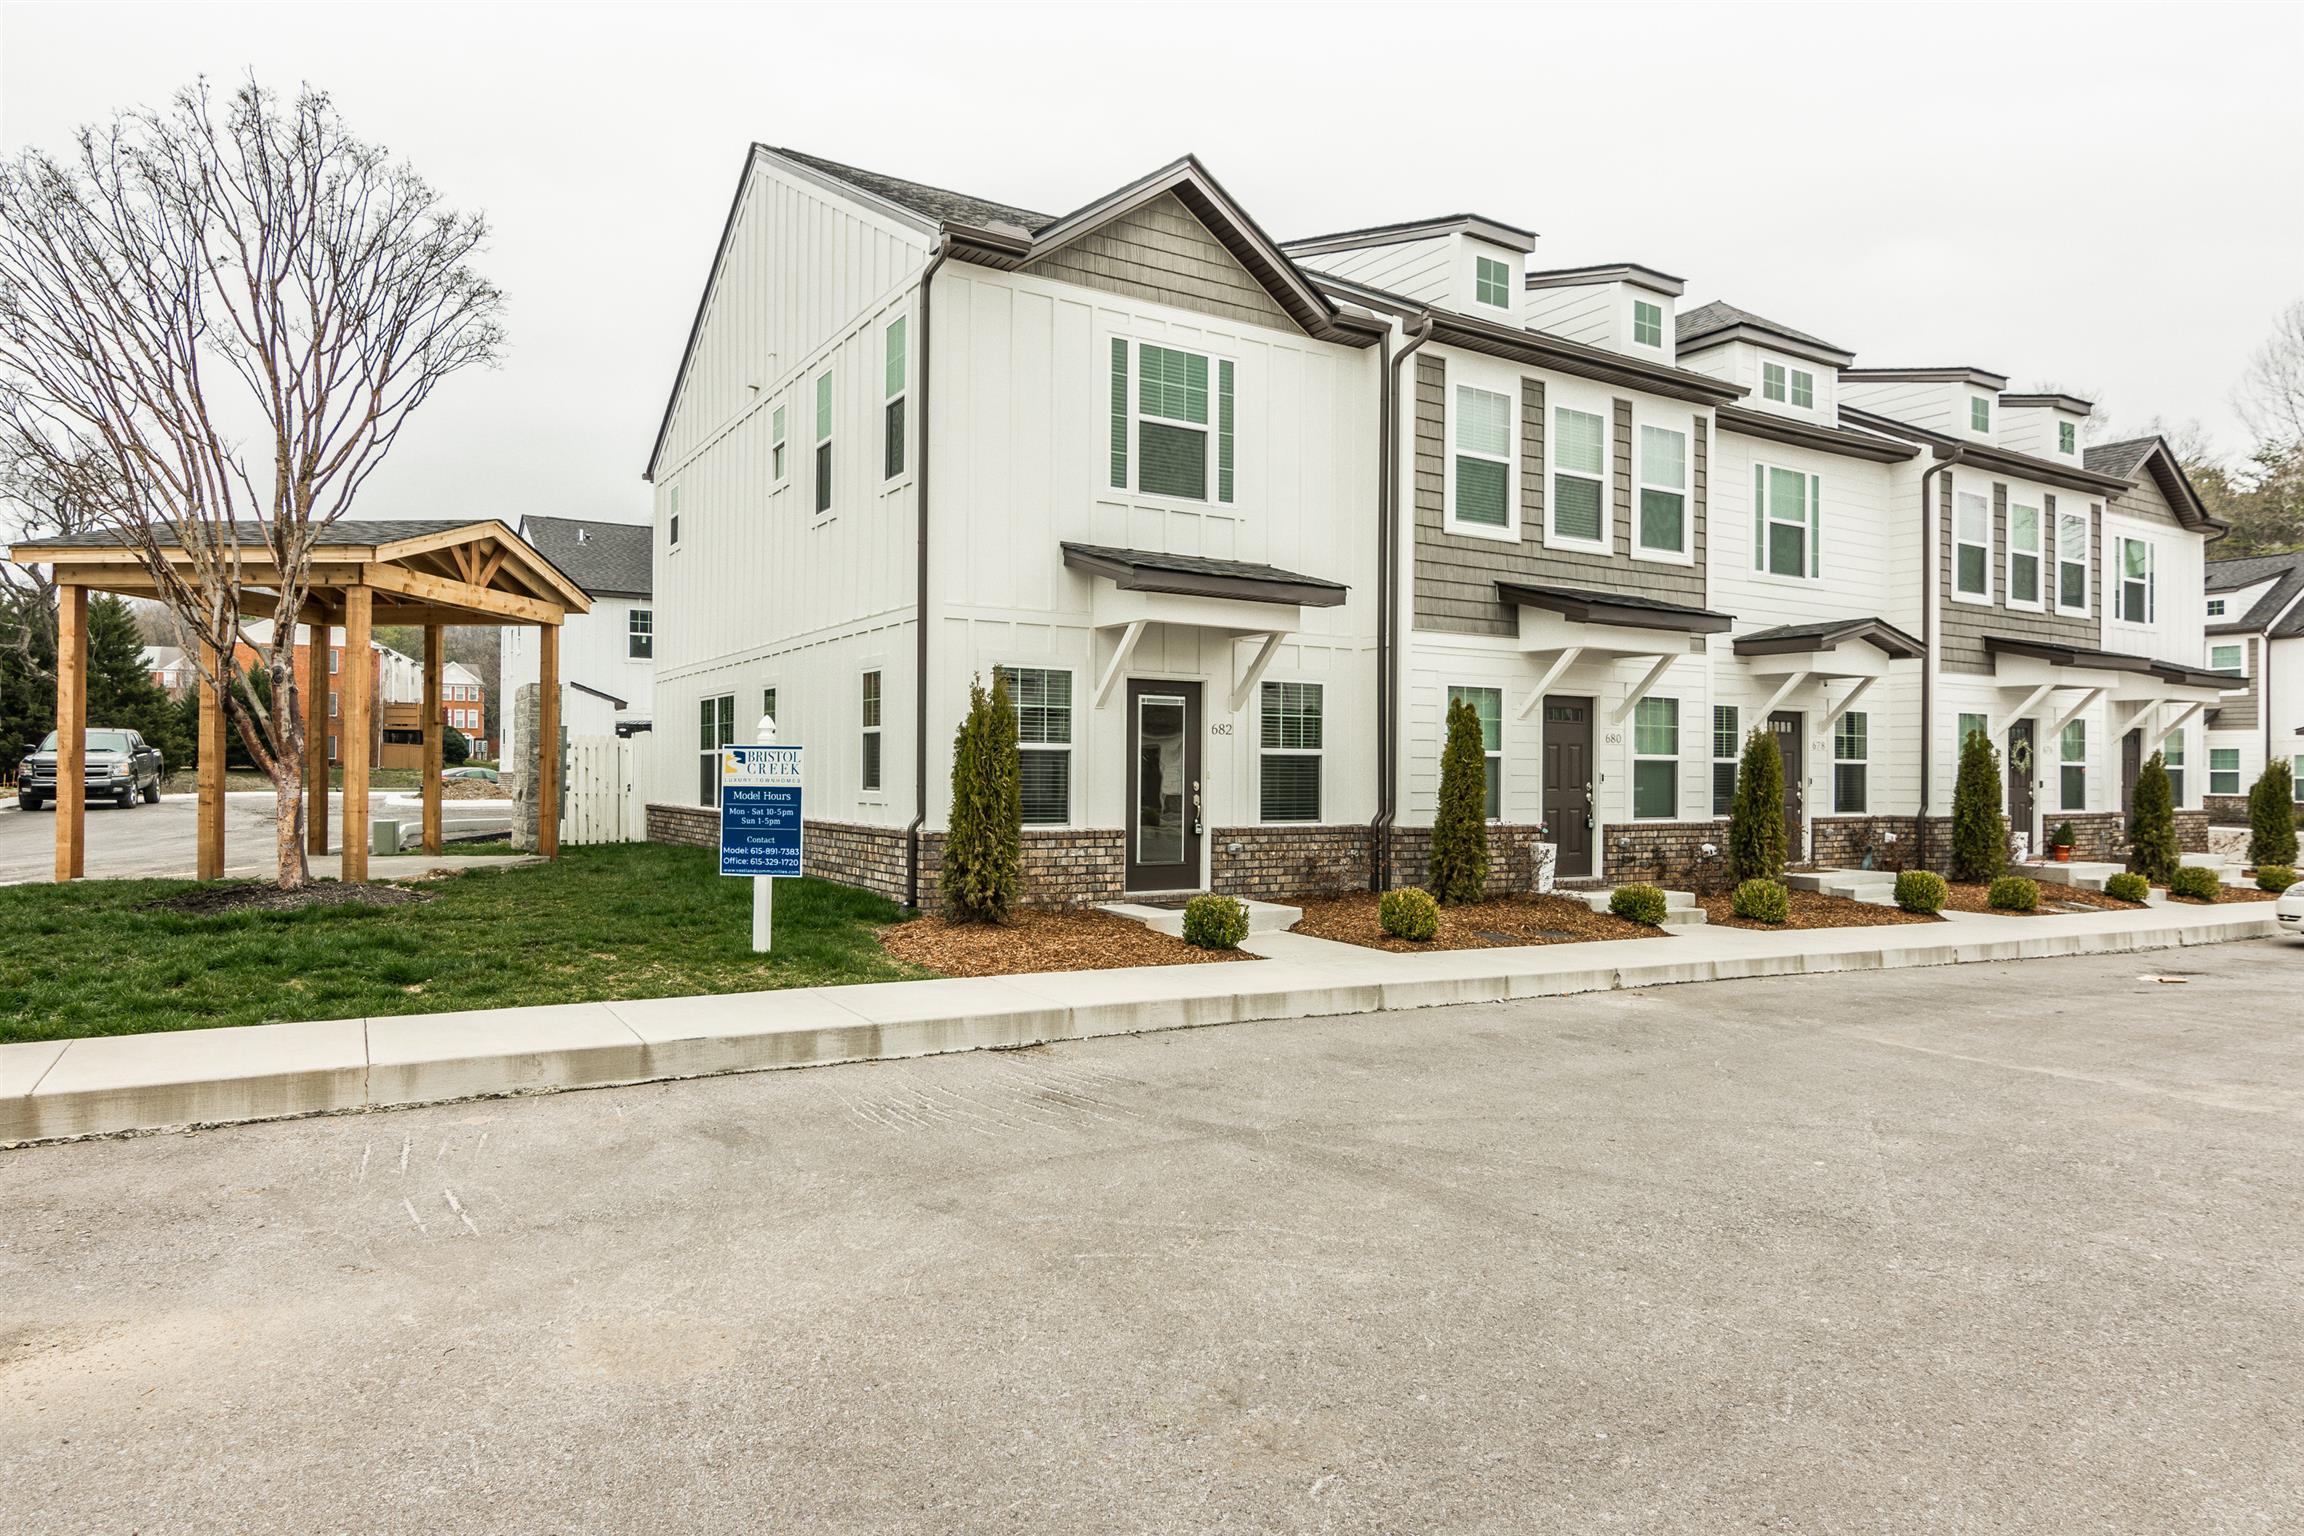 624 Bristol Creek Dr, Nashville, TN 37221 - Nashville, TN real estate listing